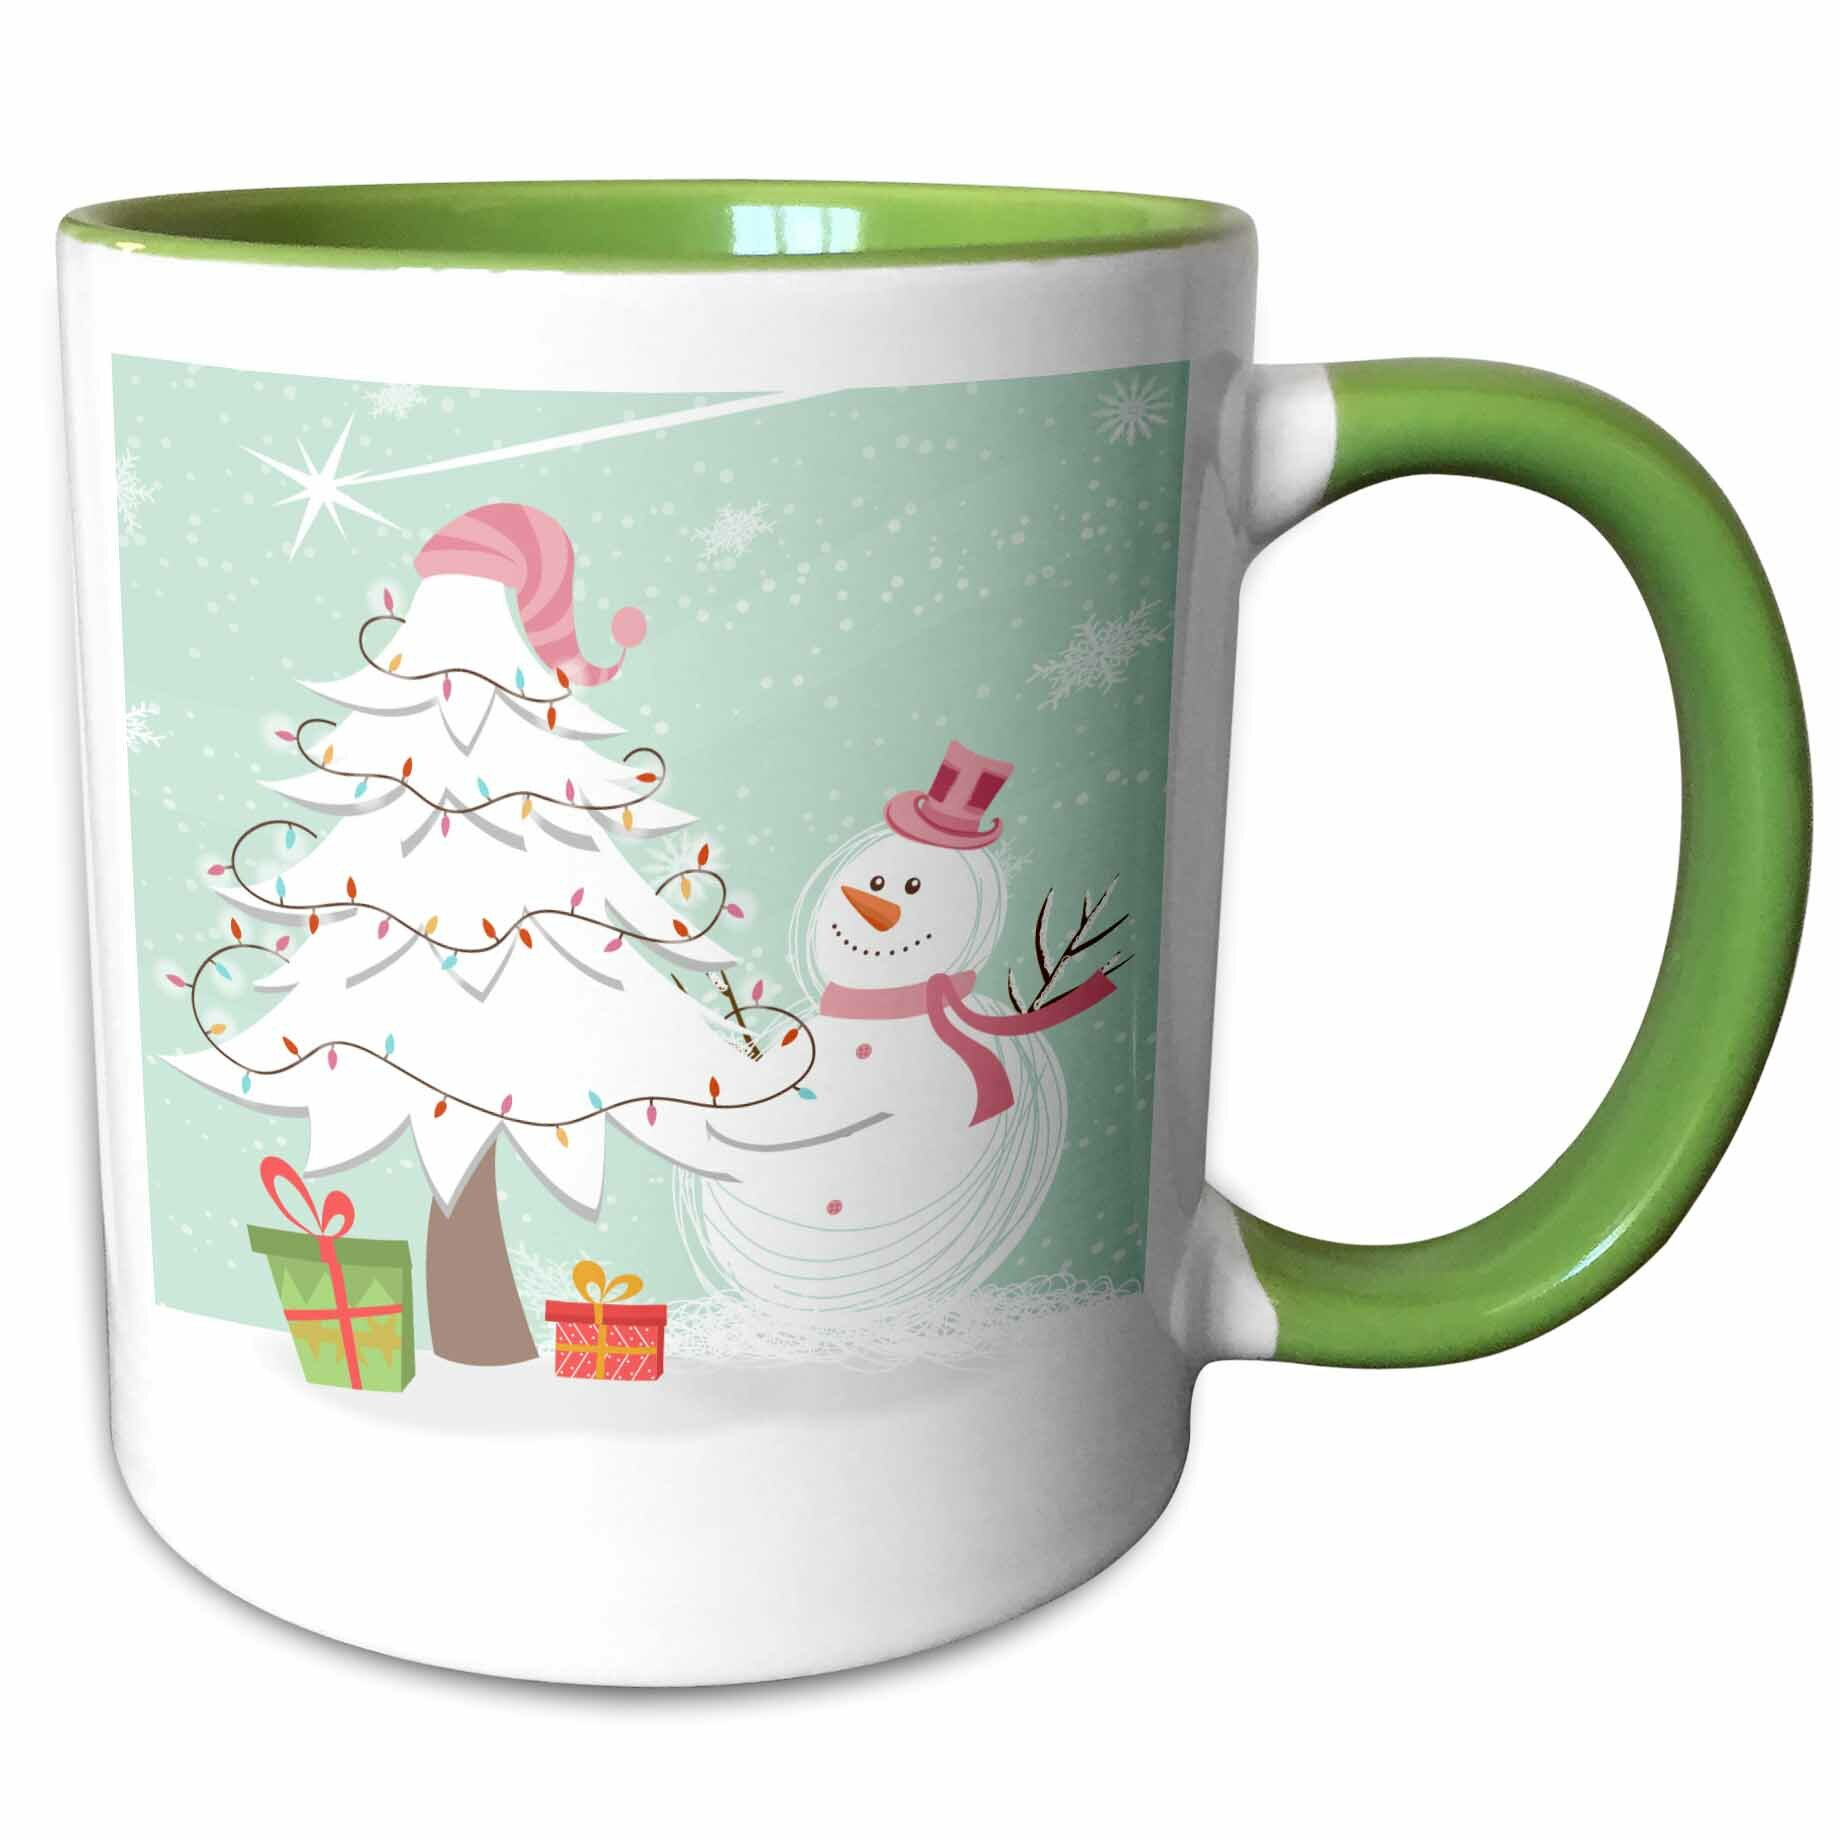 Steward Cute Whimsical Christmas Tree And Winter Snowman Scene Coffee Mug